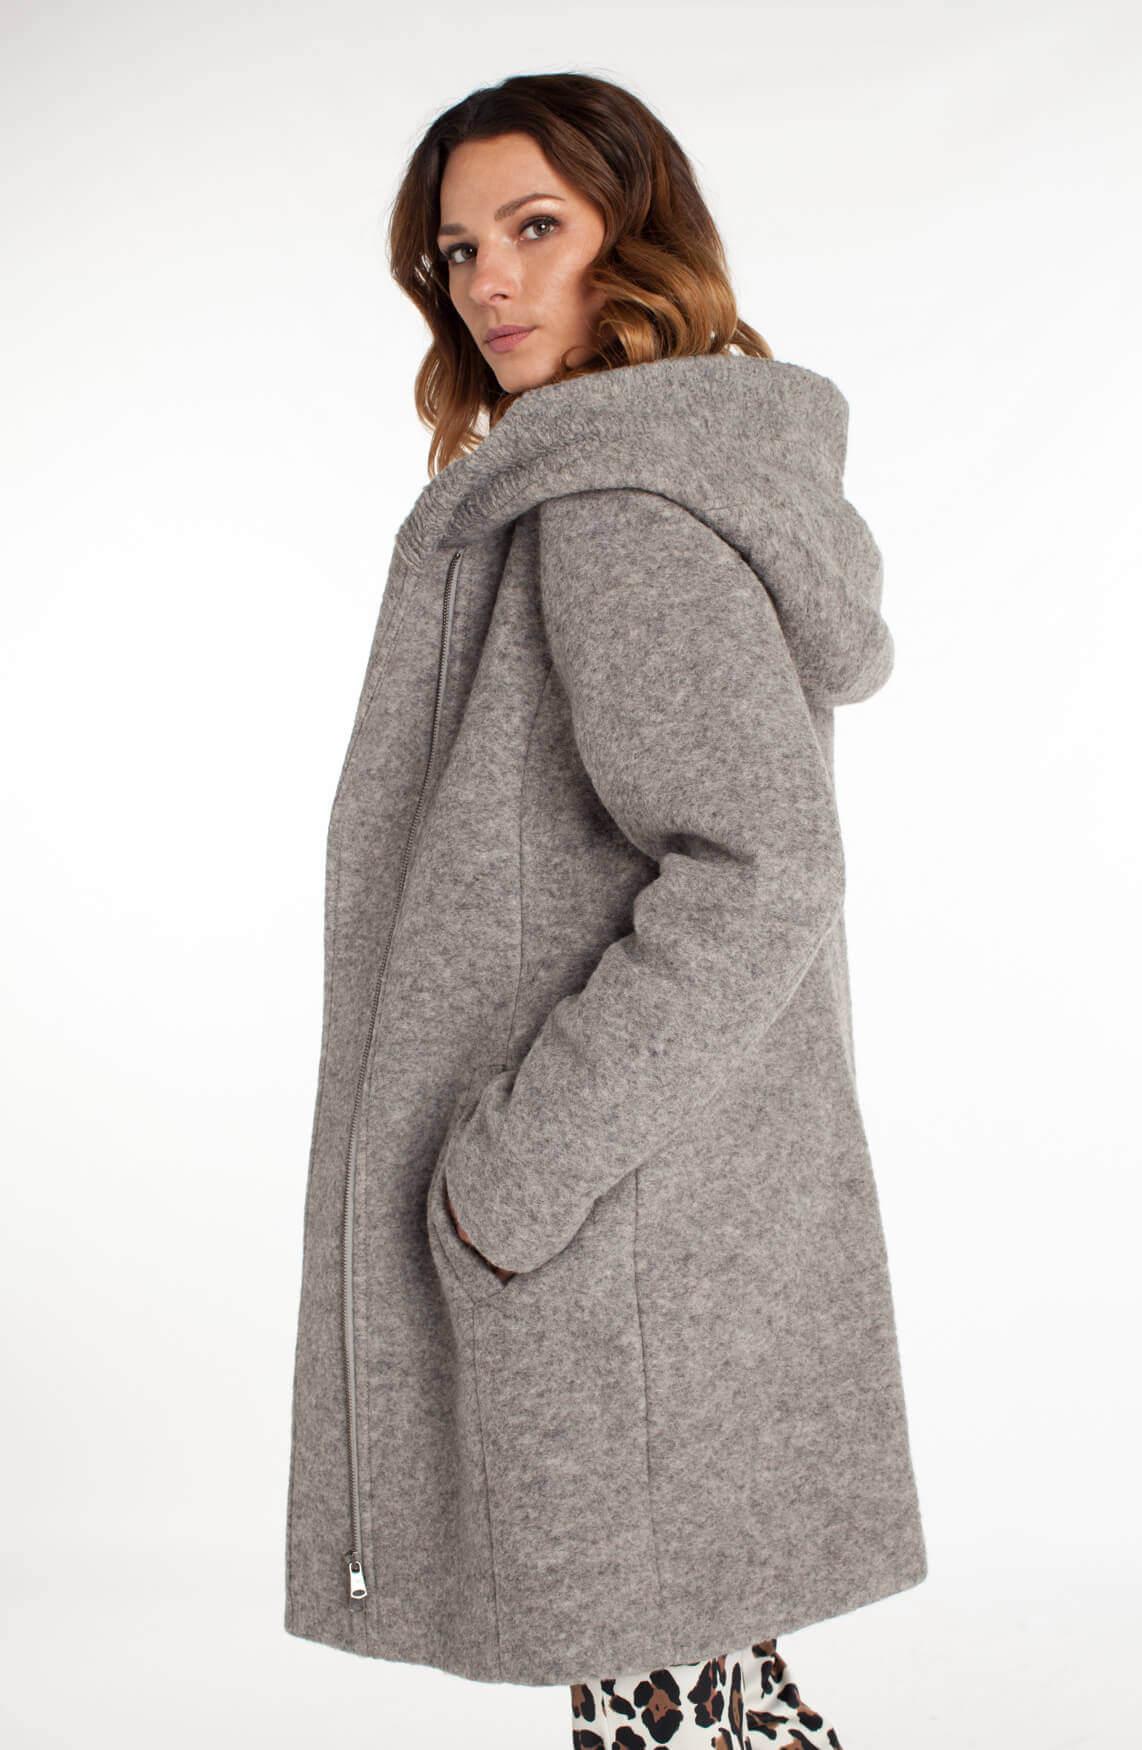 Uitgelezene Beaumont Dames Wollen mantel Grijs   Jassenboutique VB-25